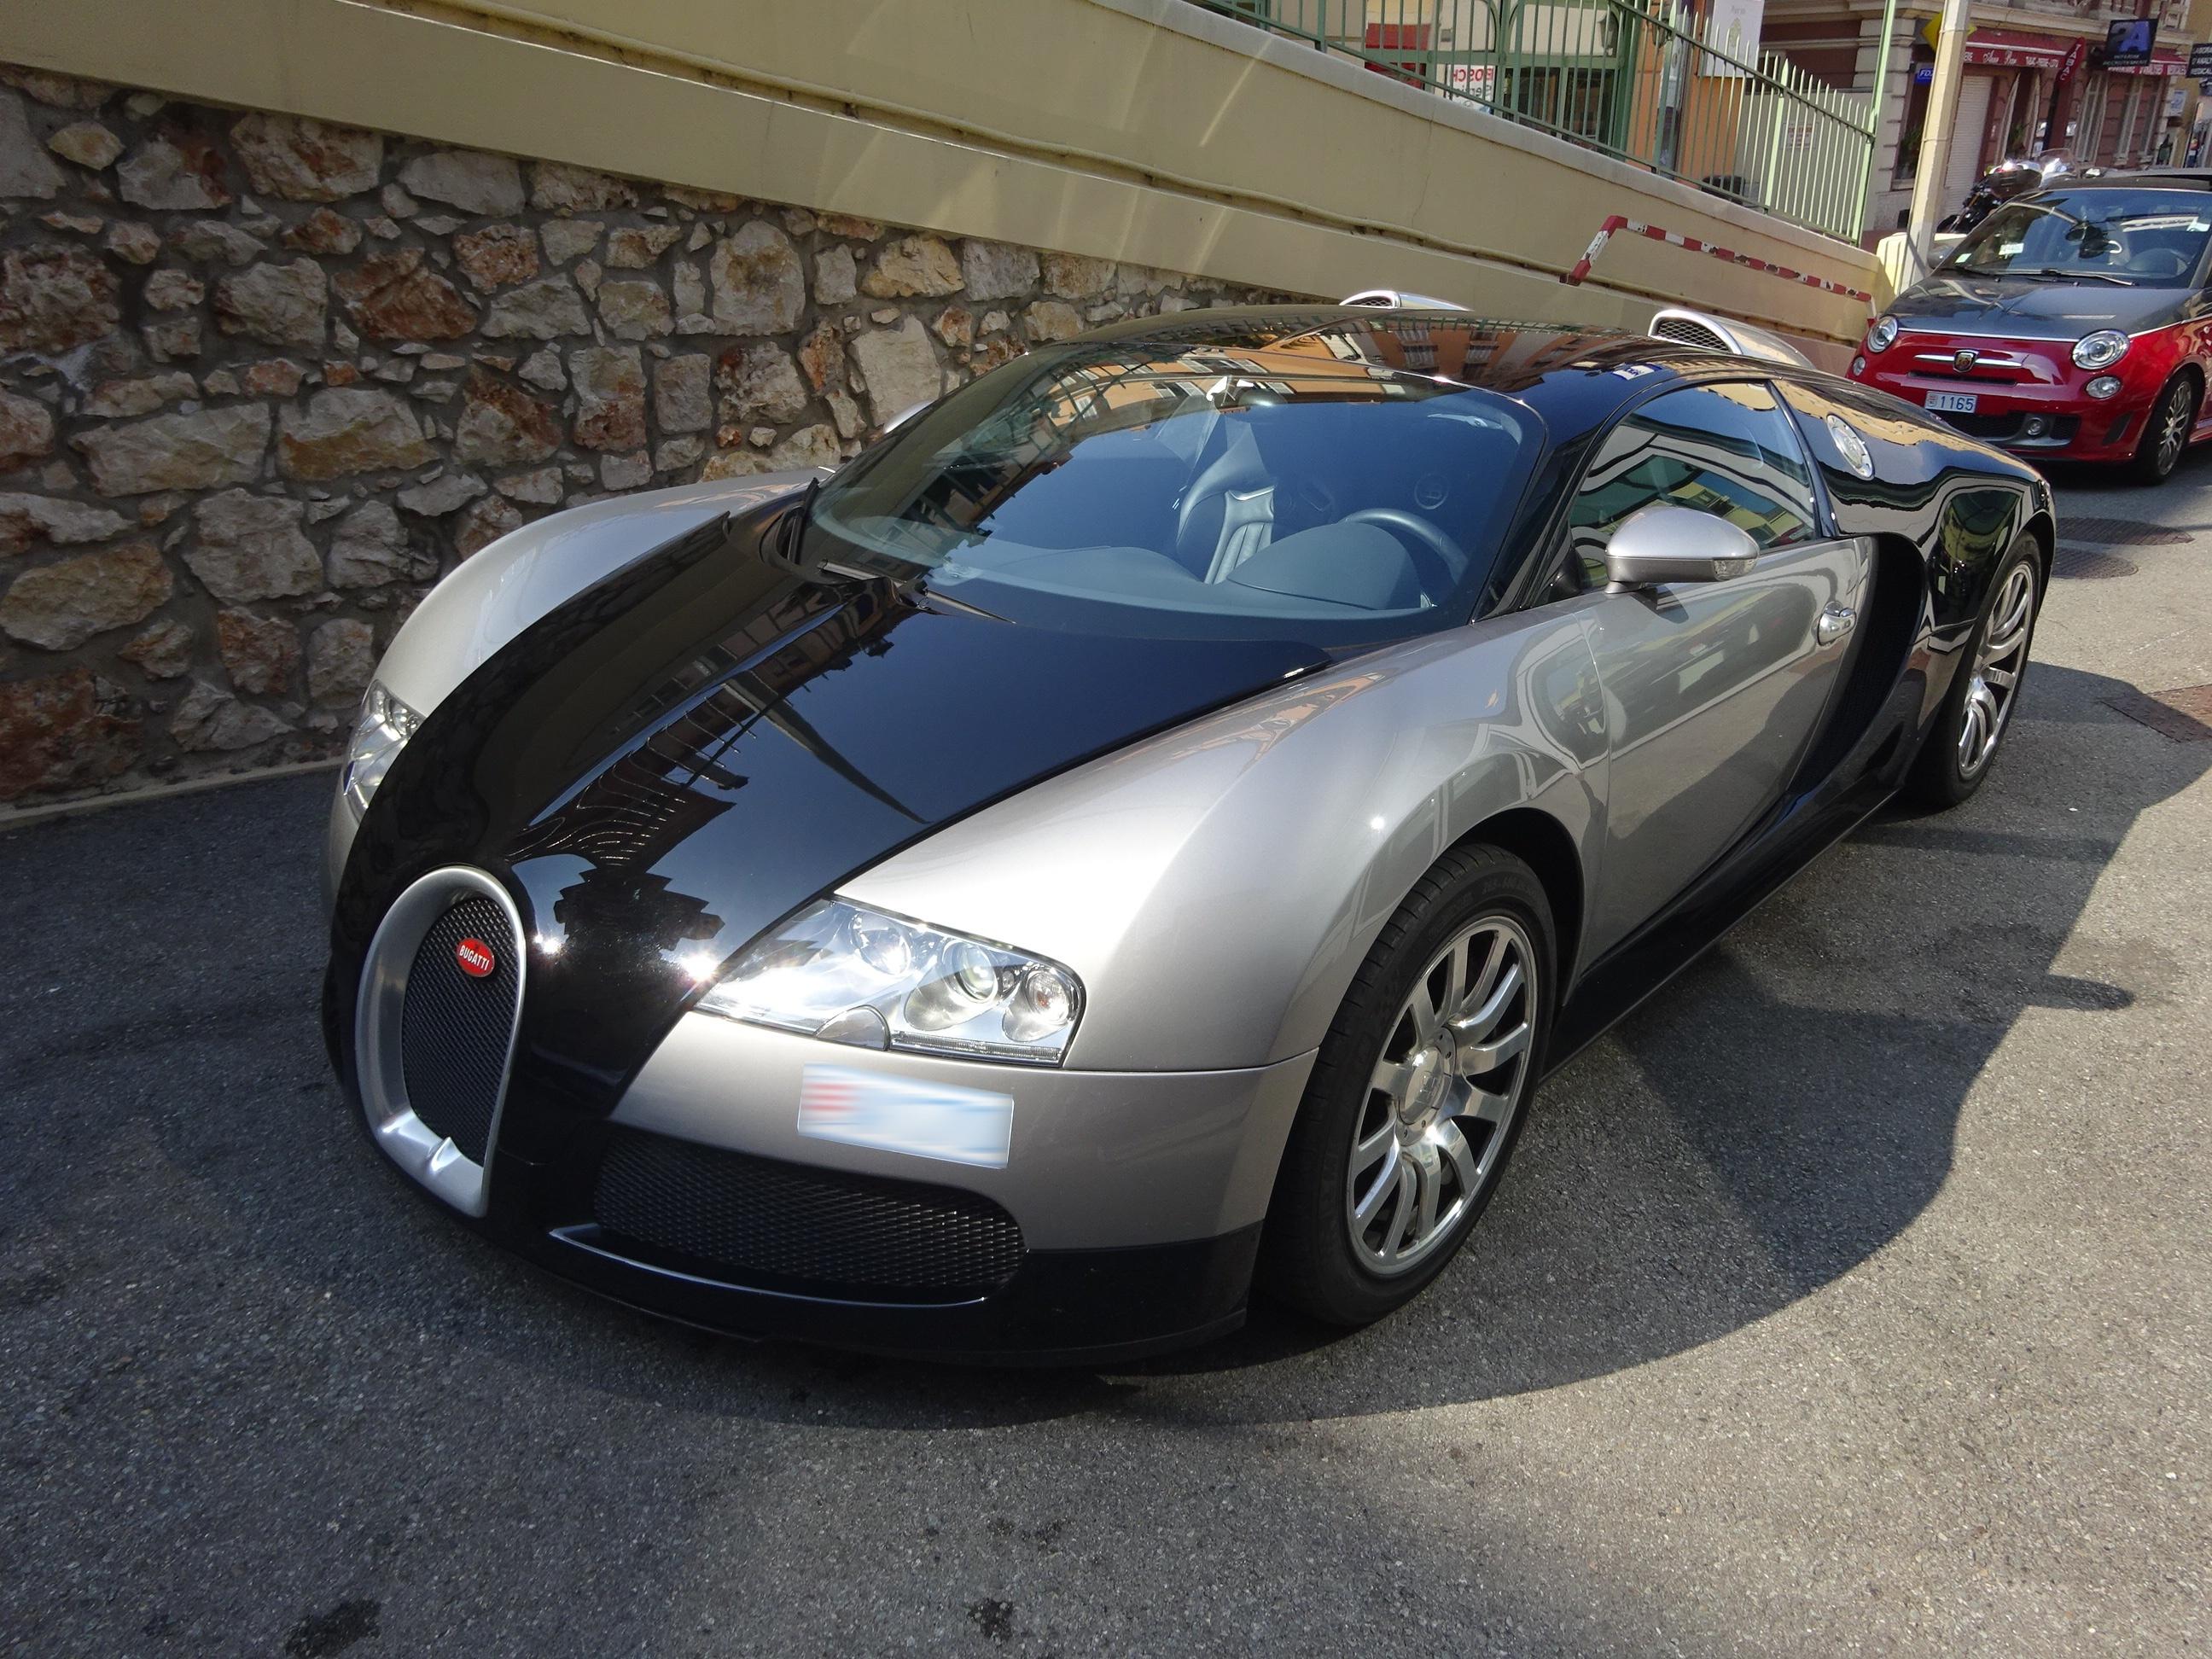 p0gebx3h7hw7dmwcakeikhf48nvrac Amazing Bugatti Veyron Price In Egypt Cars Trend